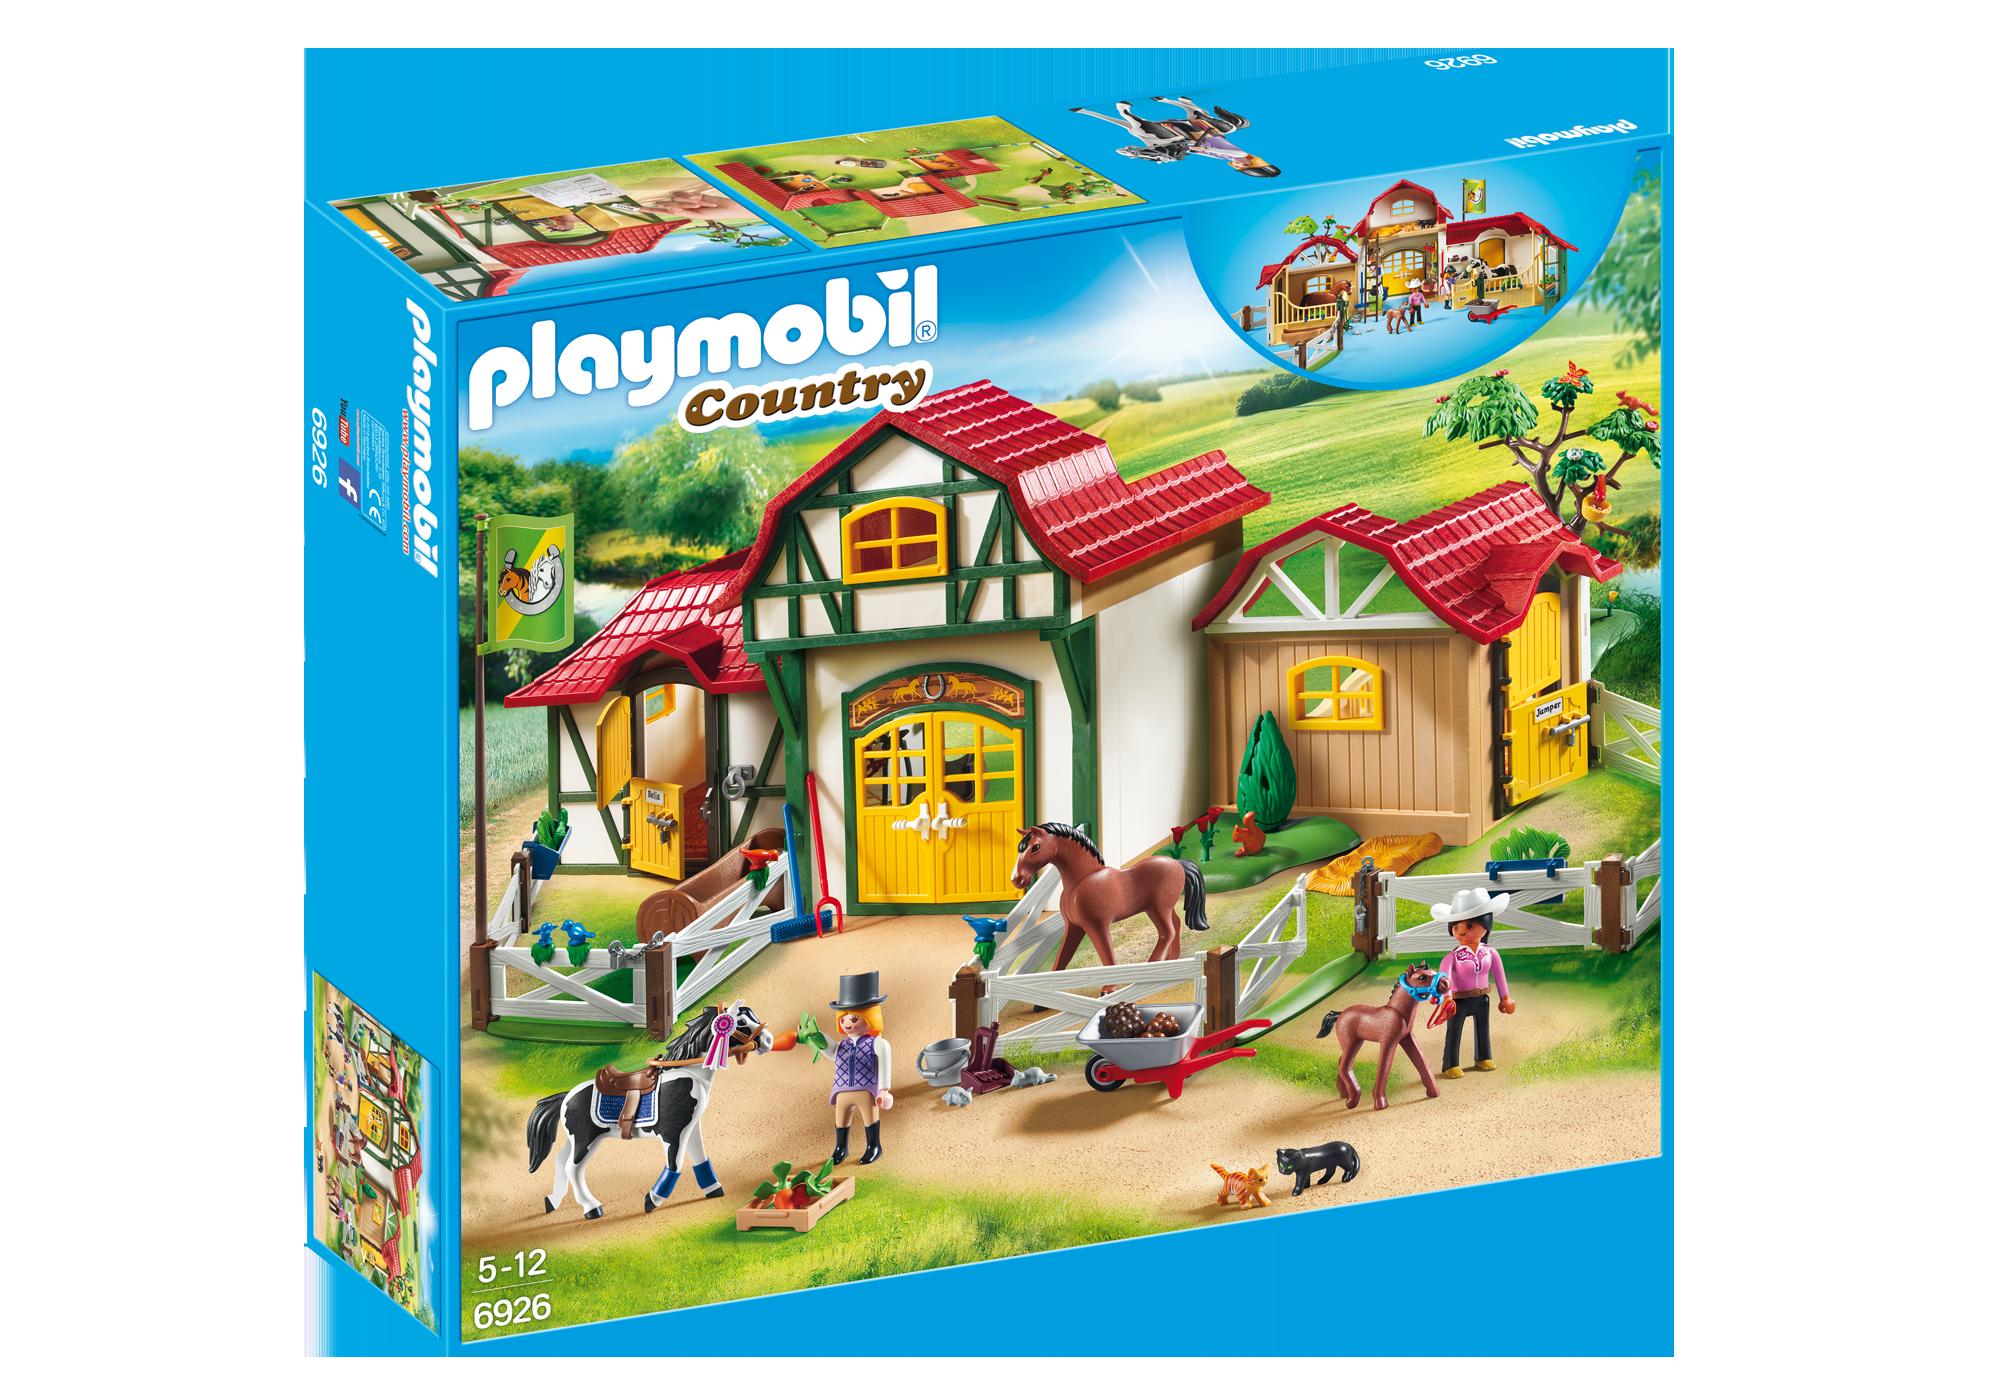 http://media.playmobil.com/i/playmobil/6926_product_box_front/Großer Reiterhof